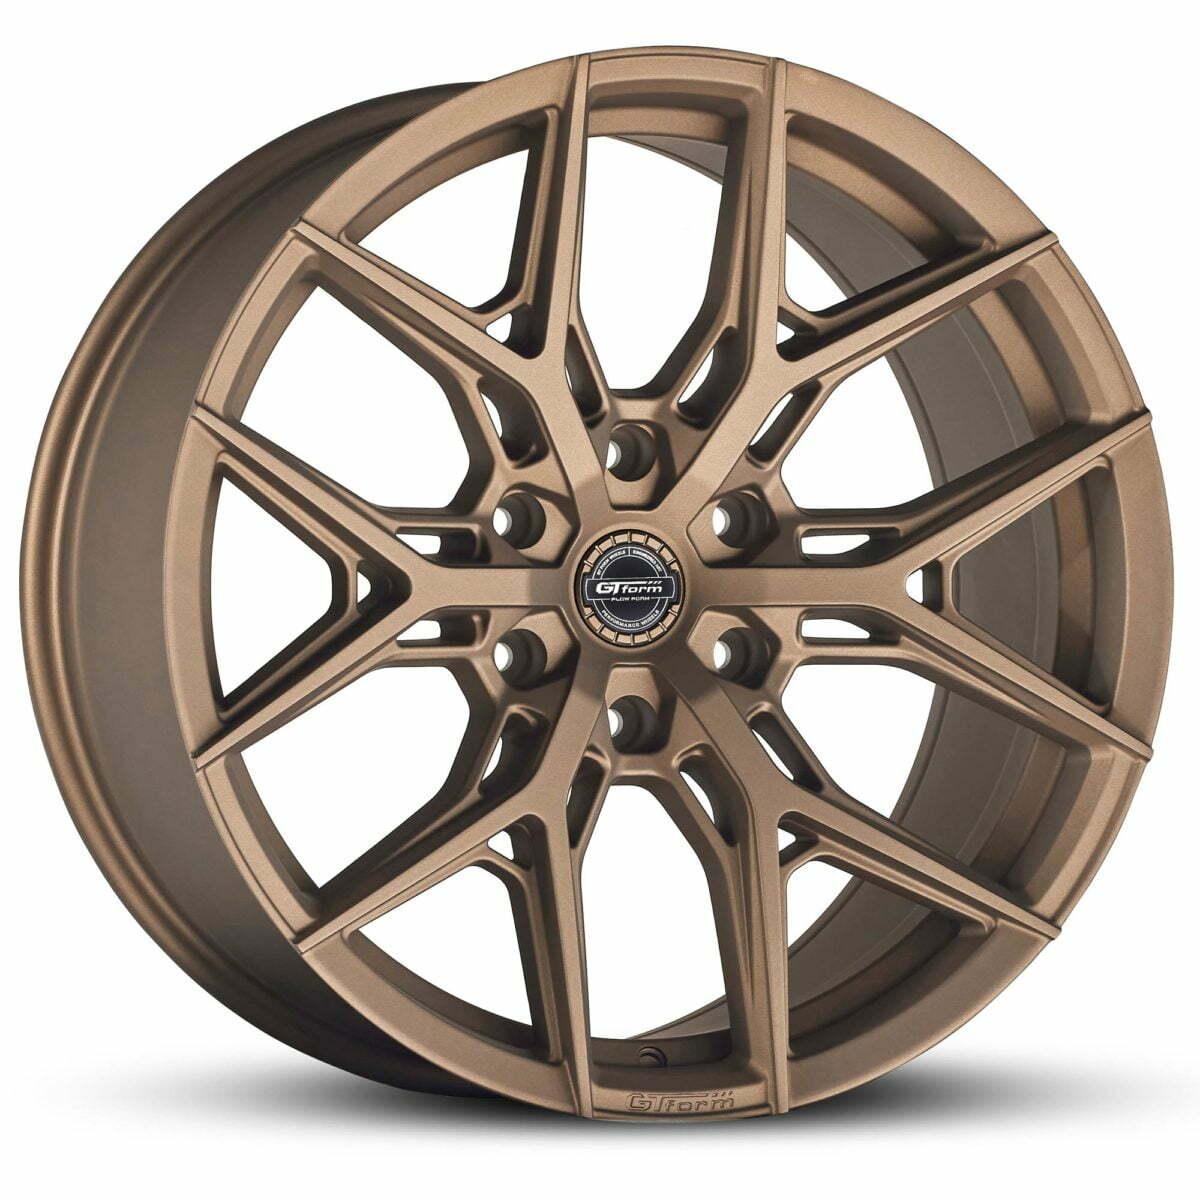 4x4 Wheels GT Form GF-S1 Matte Bronze Wheels 6x139.7 rims